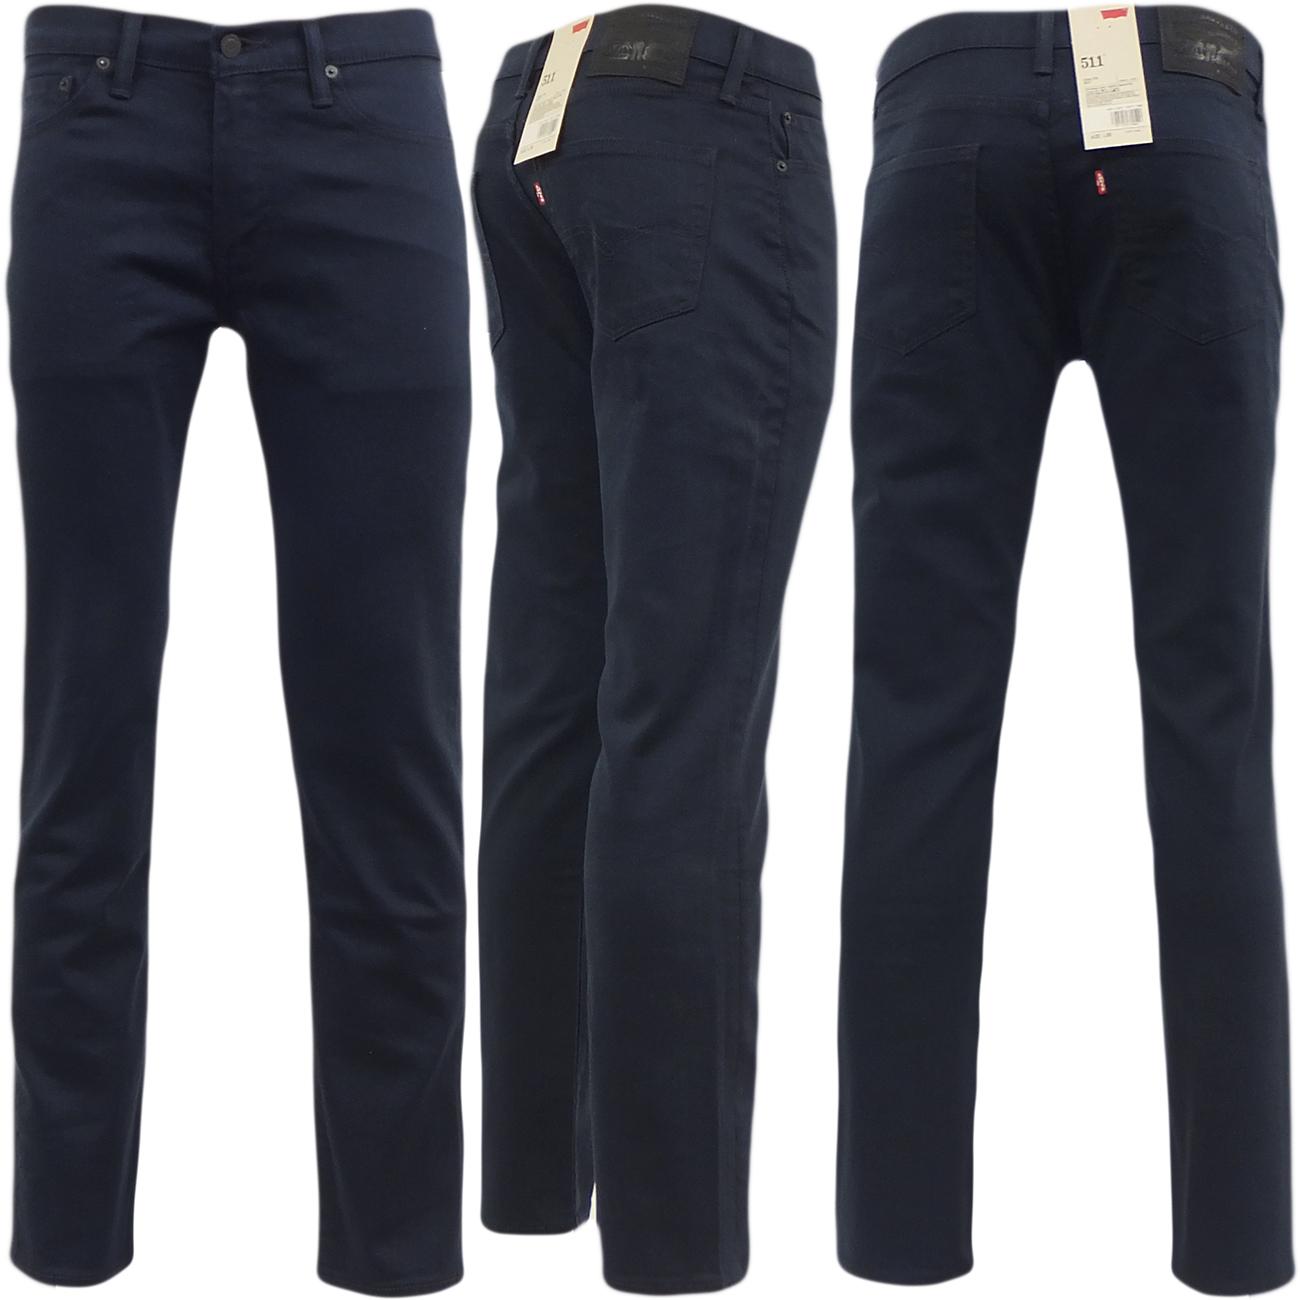 Levi slim straight jeans